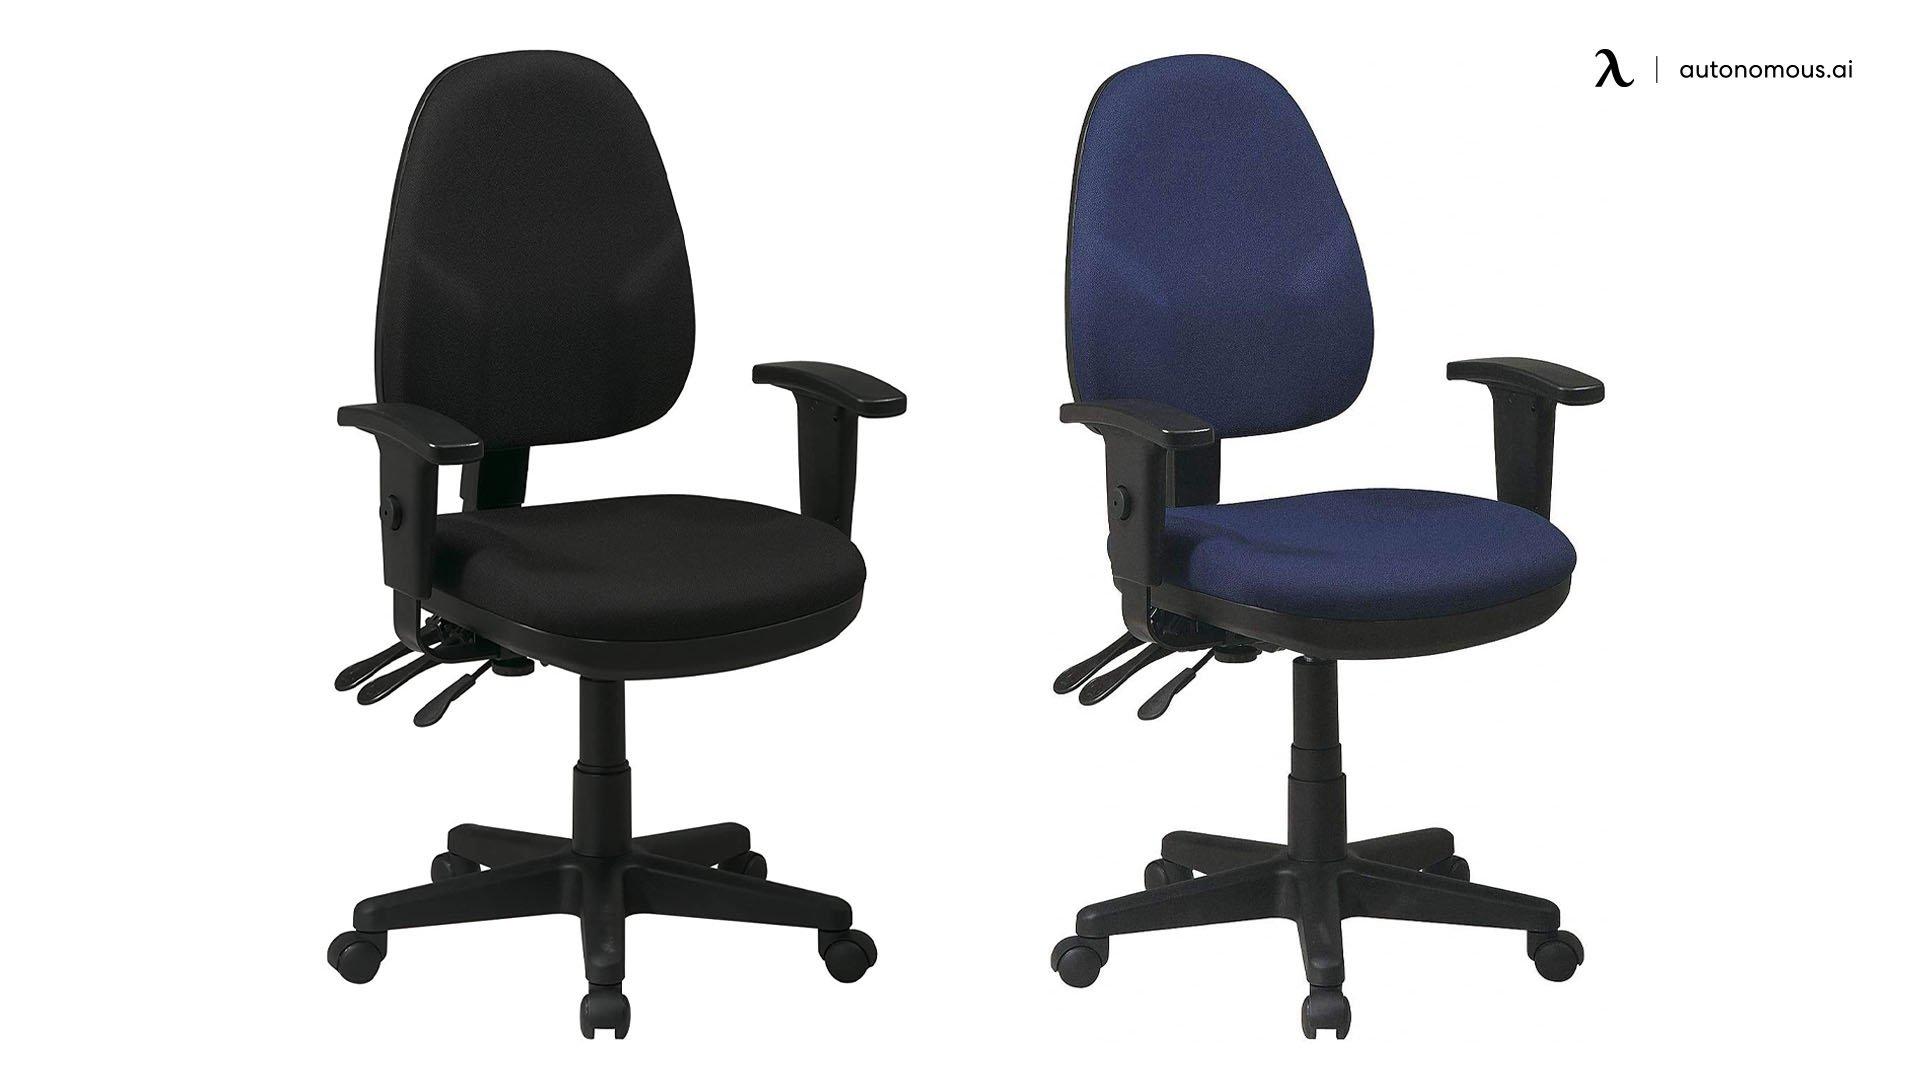 office star ergonomic chair